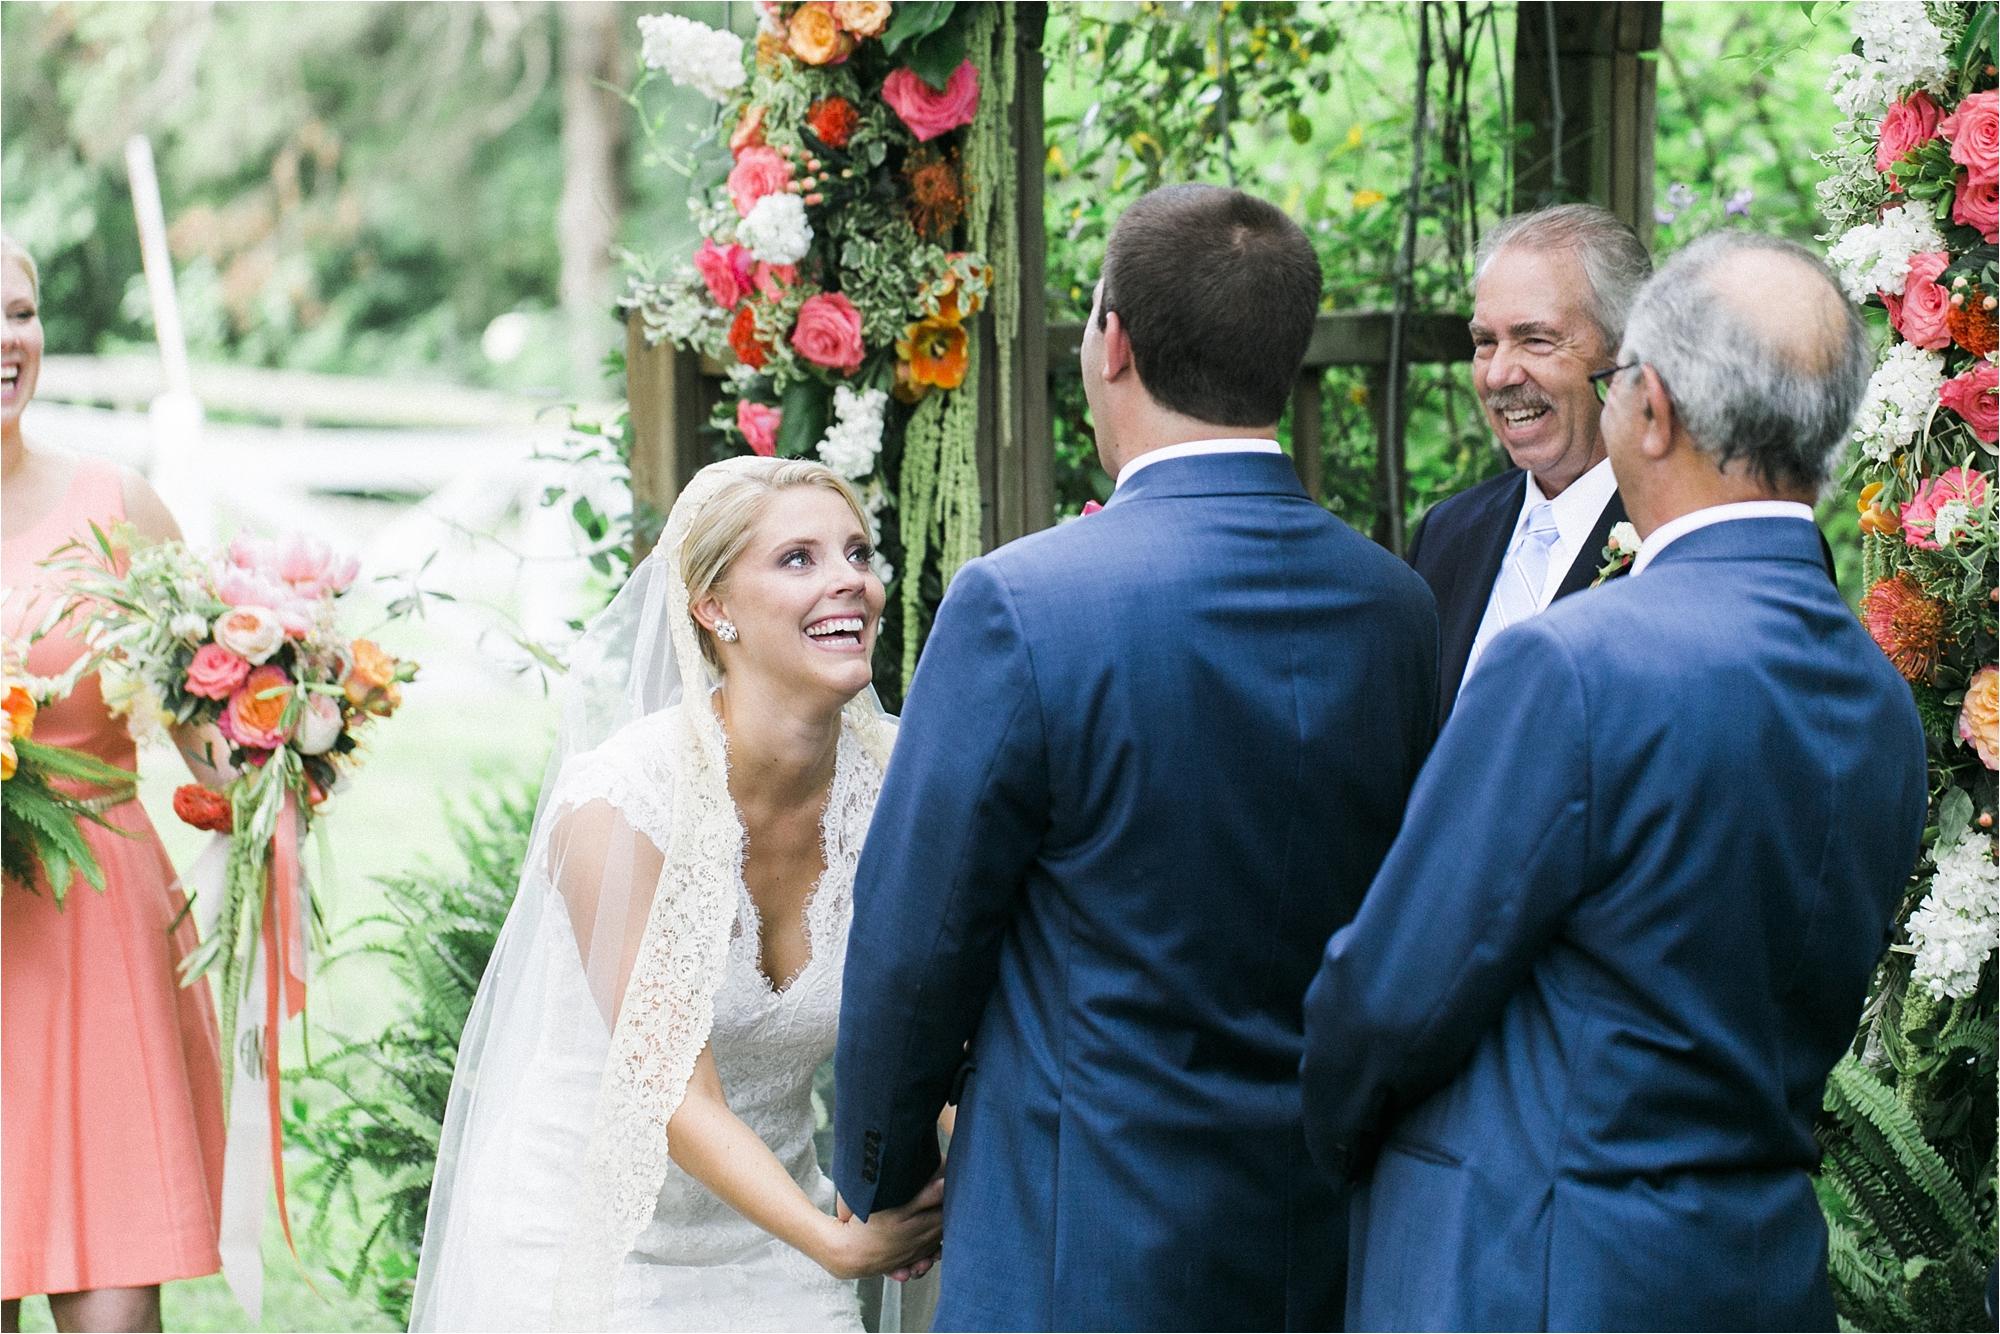 richmond-virginia-tuckahoe-plantation-coral-summer-wedding-stephanie-yonce-photos_0031.jpg